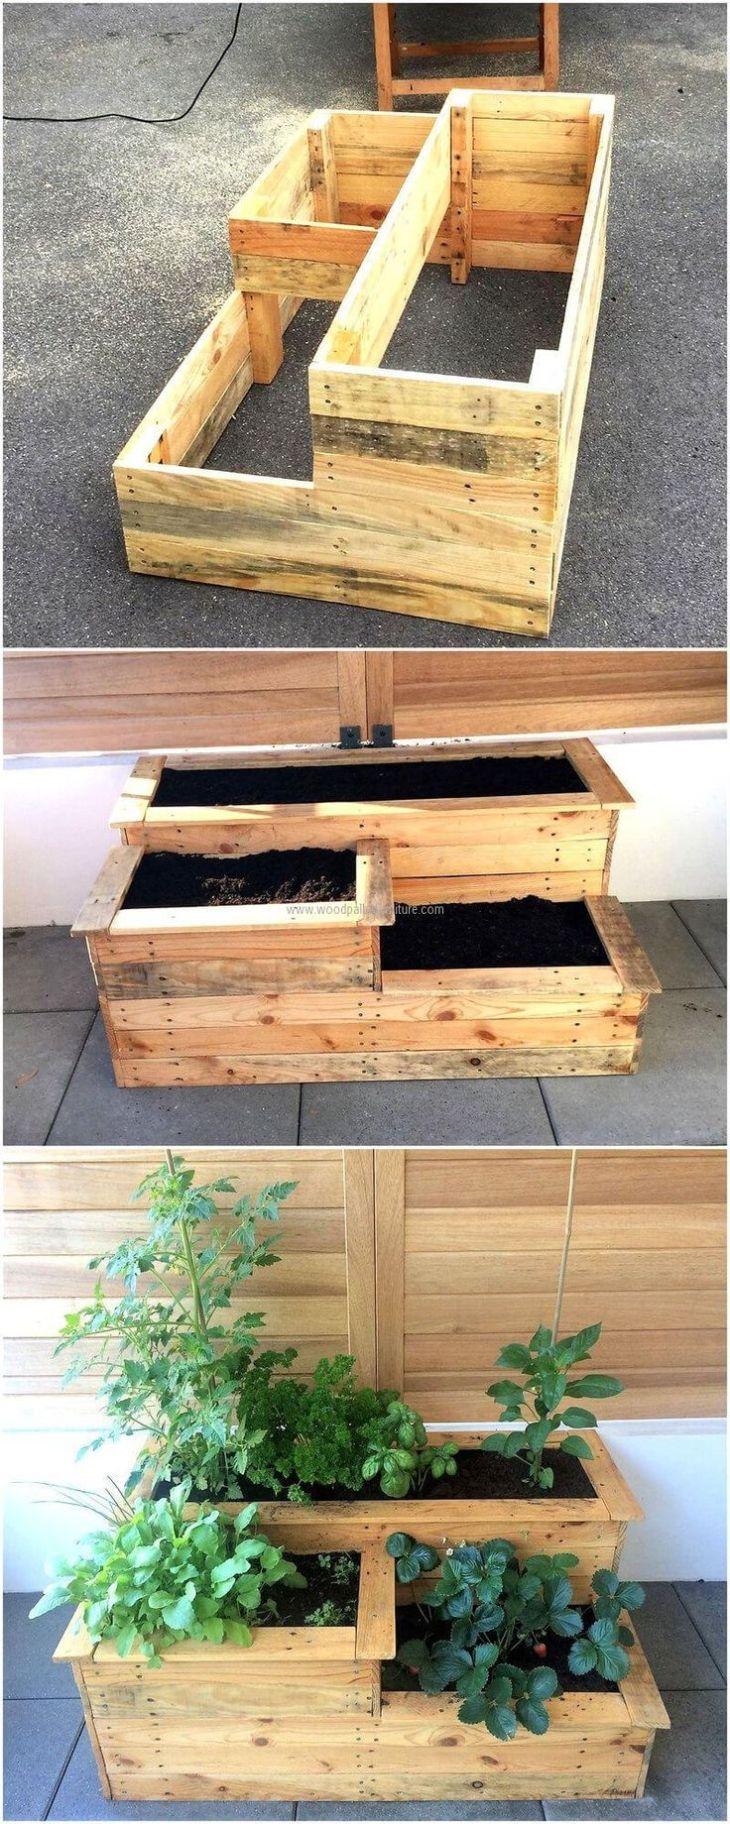 Raised Garden Bed Ideas Repurposed wood Ideas for decorating